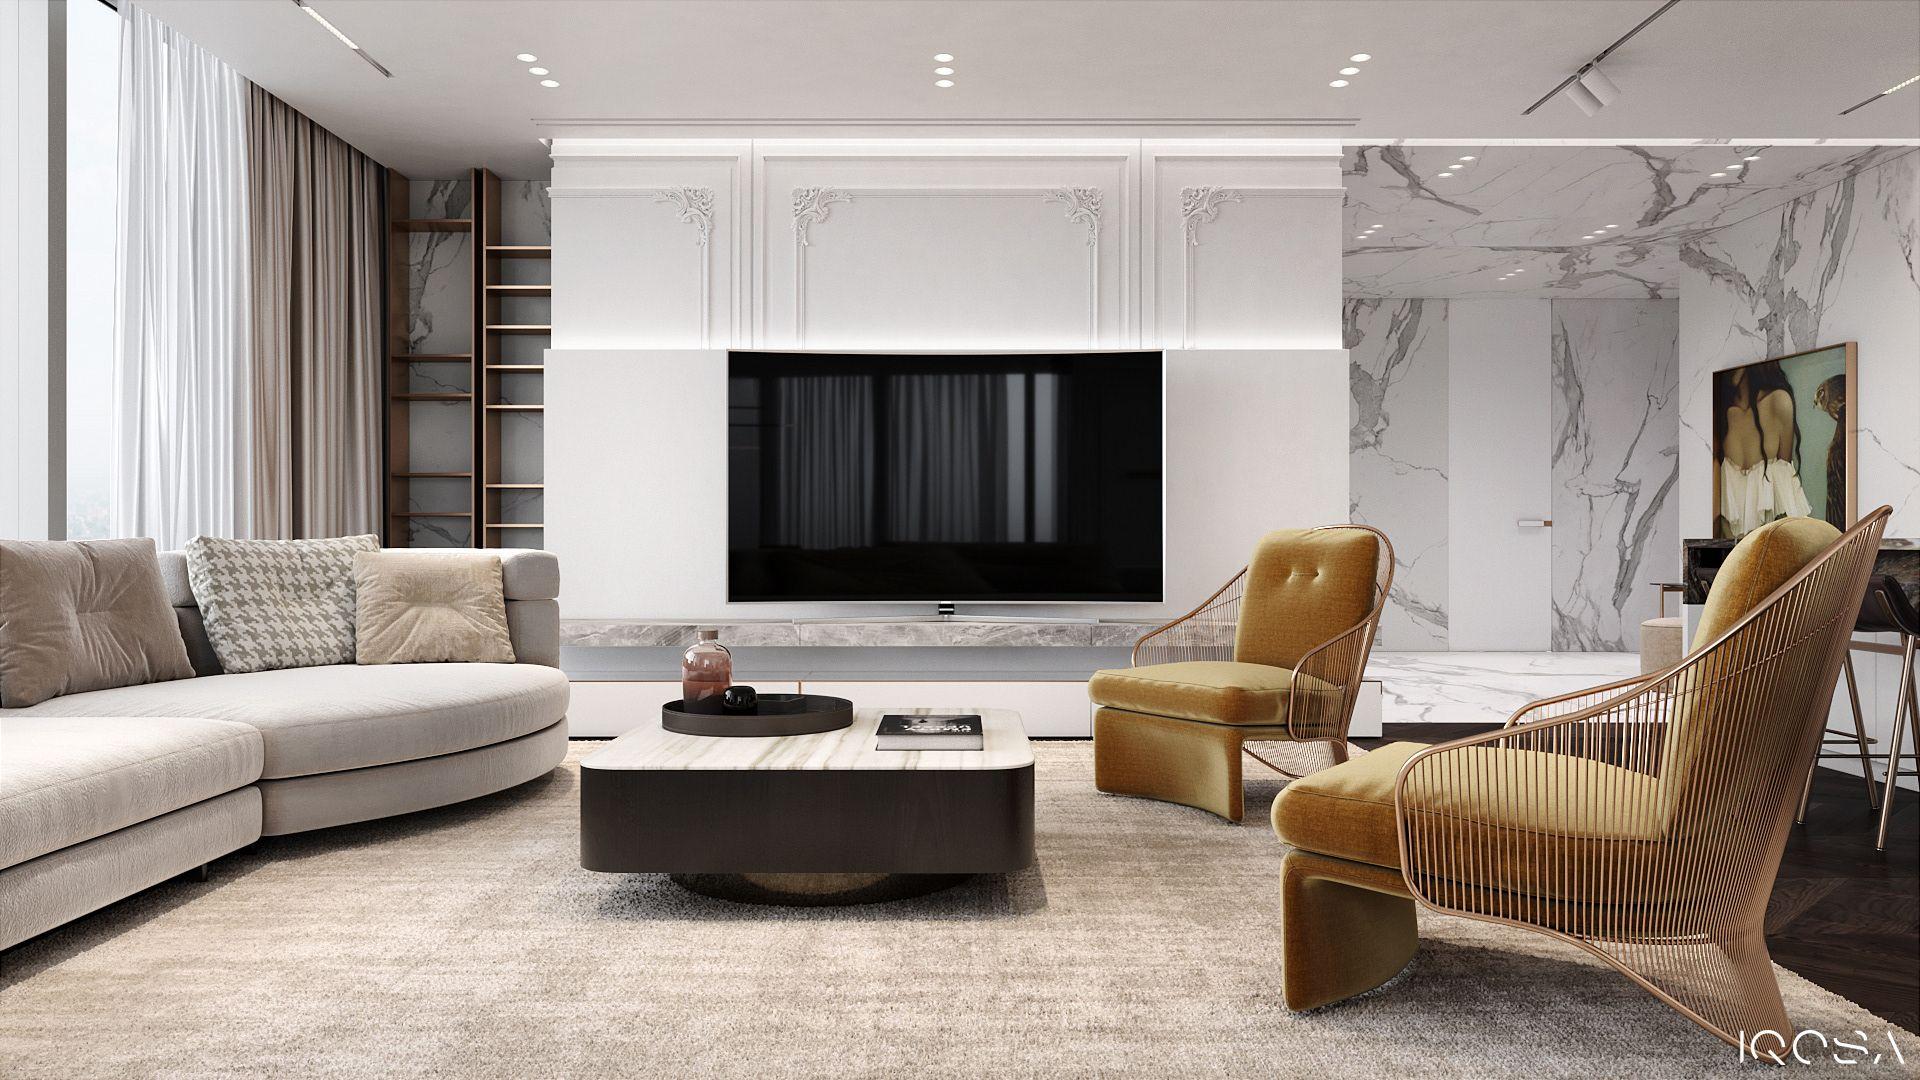 Luxurious apartment on Behance | Luxury apartments ...